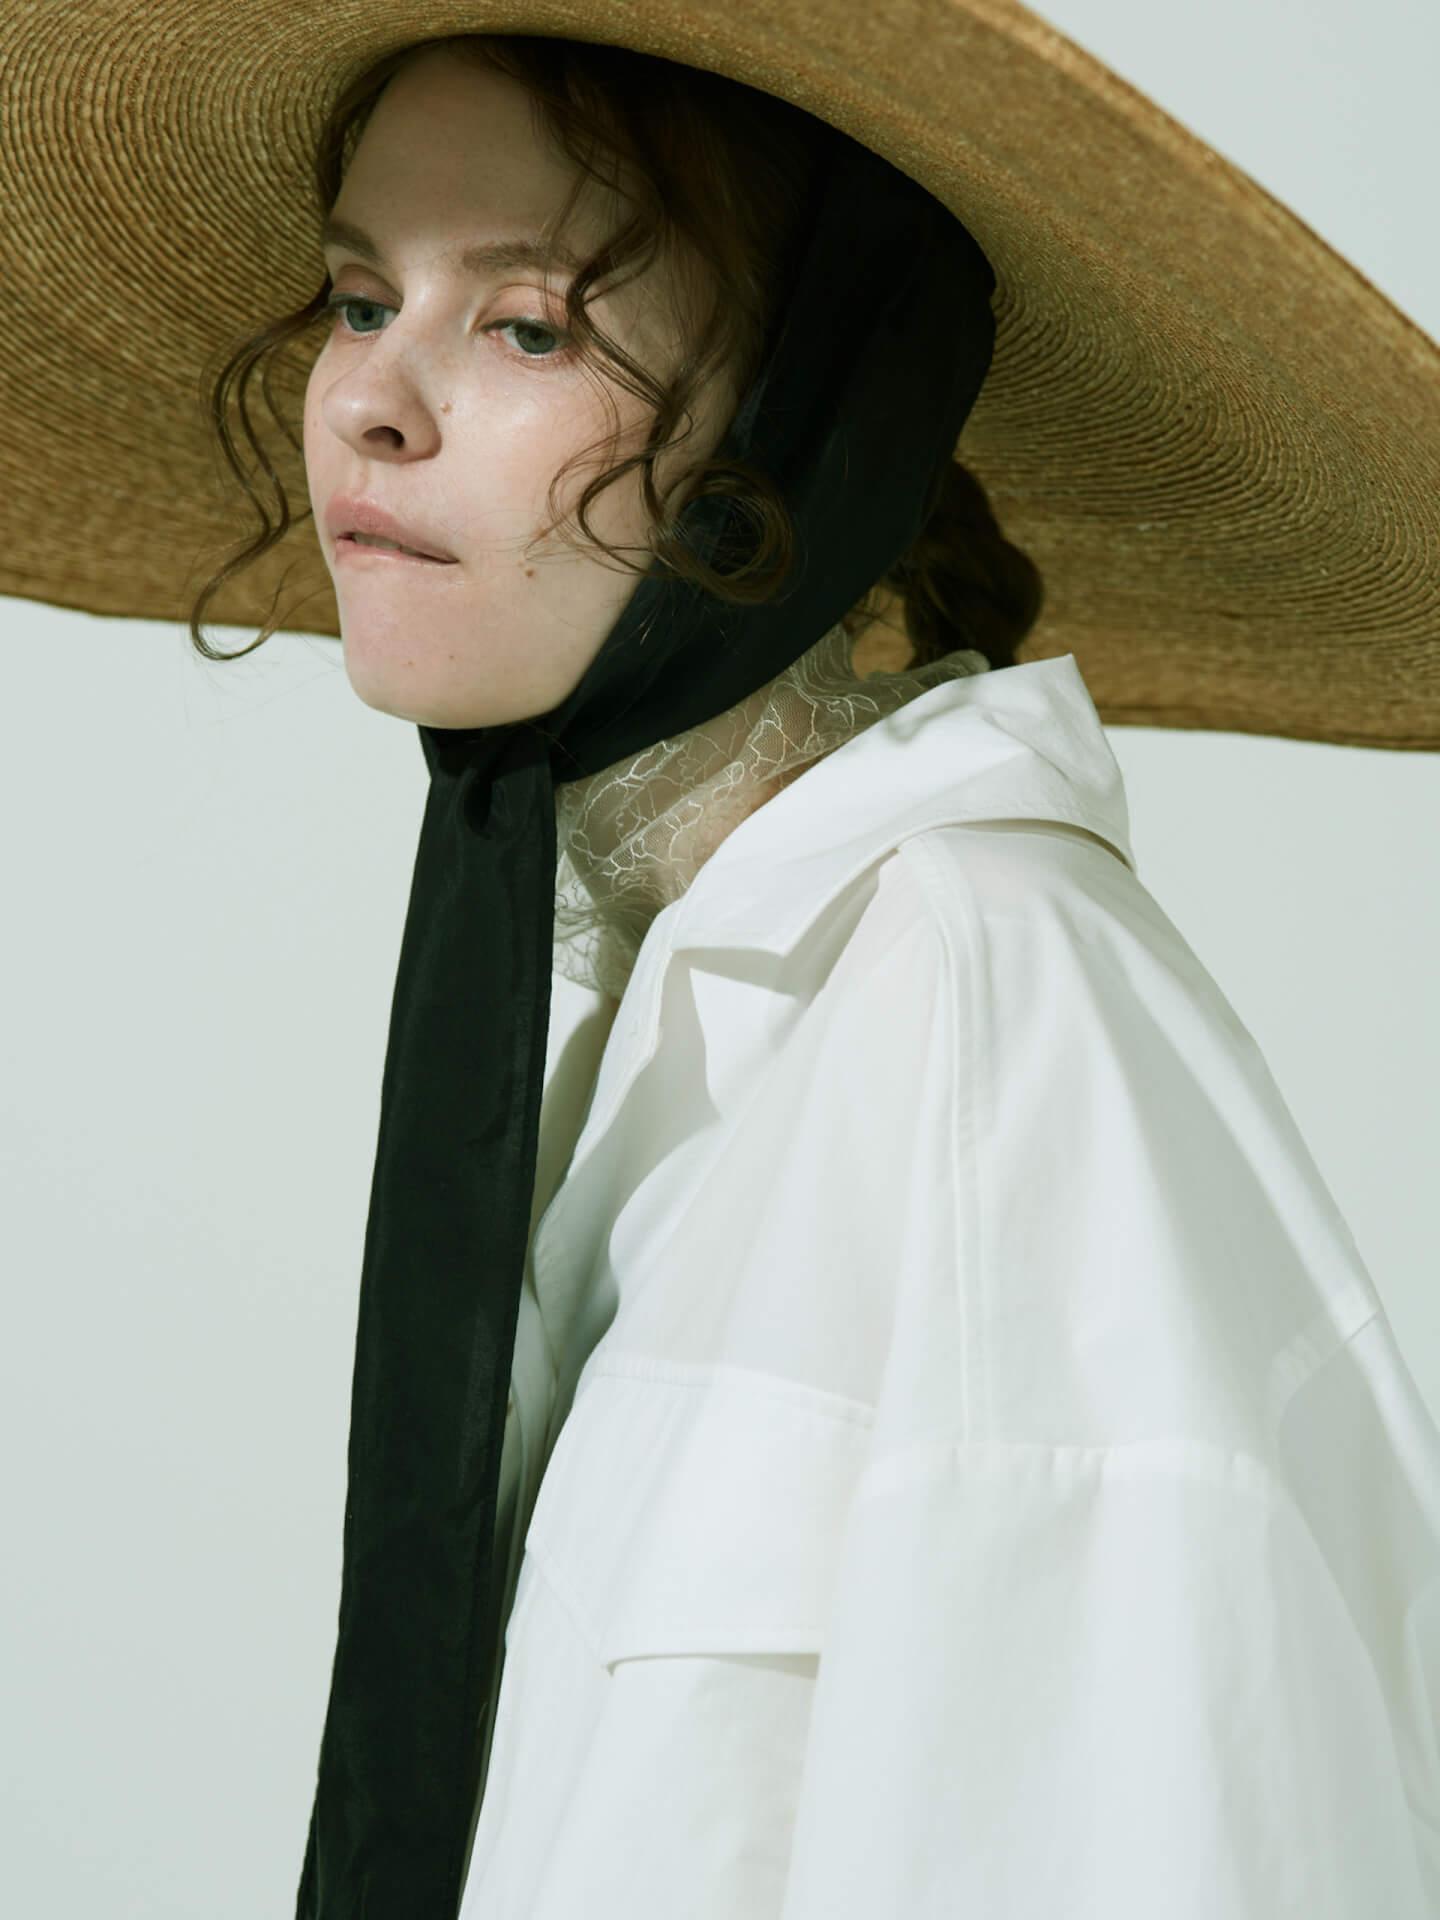 CHAIのベーシスト・YUUKIによるプロジェクト「YMYM」よりファッションブランドオープン!2021年春夏コレクション&描き下ろし絵画などの展示会も life210405_ymym_5